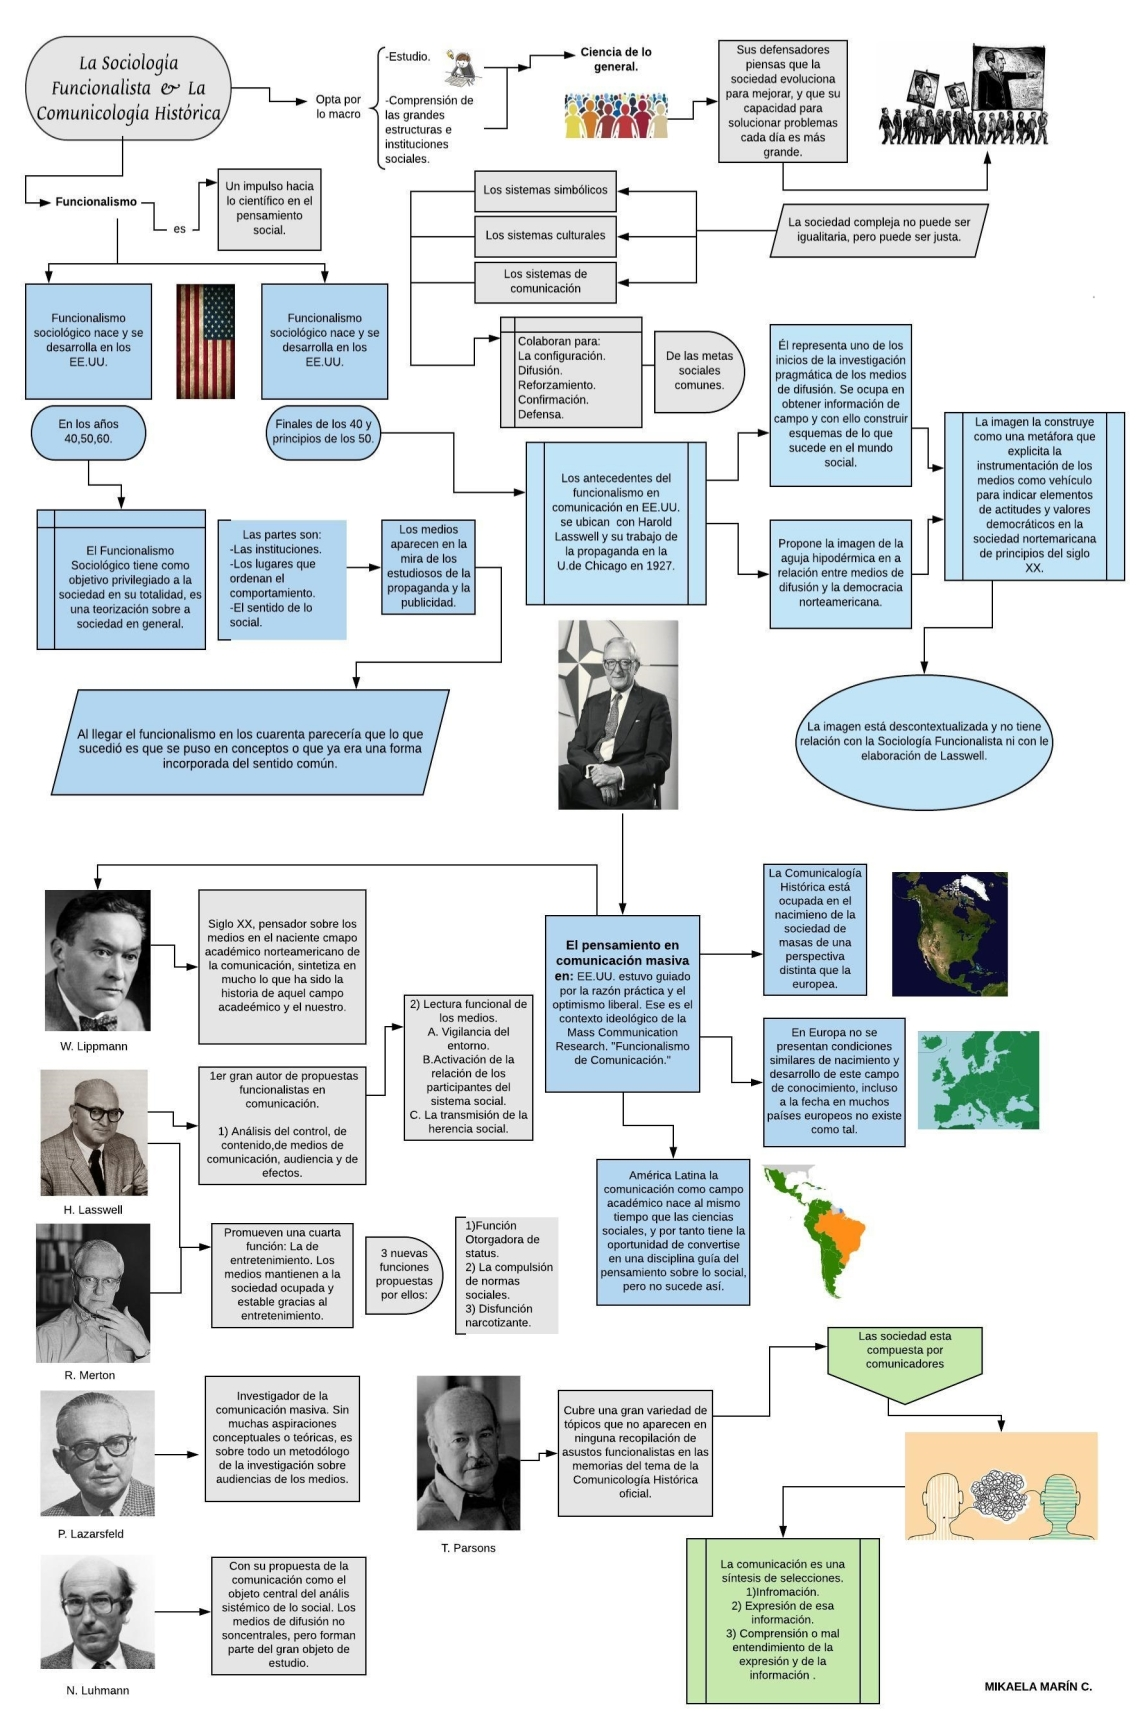 Trabajo 5 Marín Mikaela. Mapa Conceptual.jpg